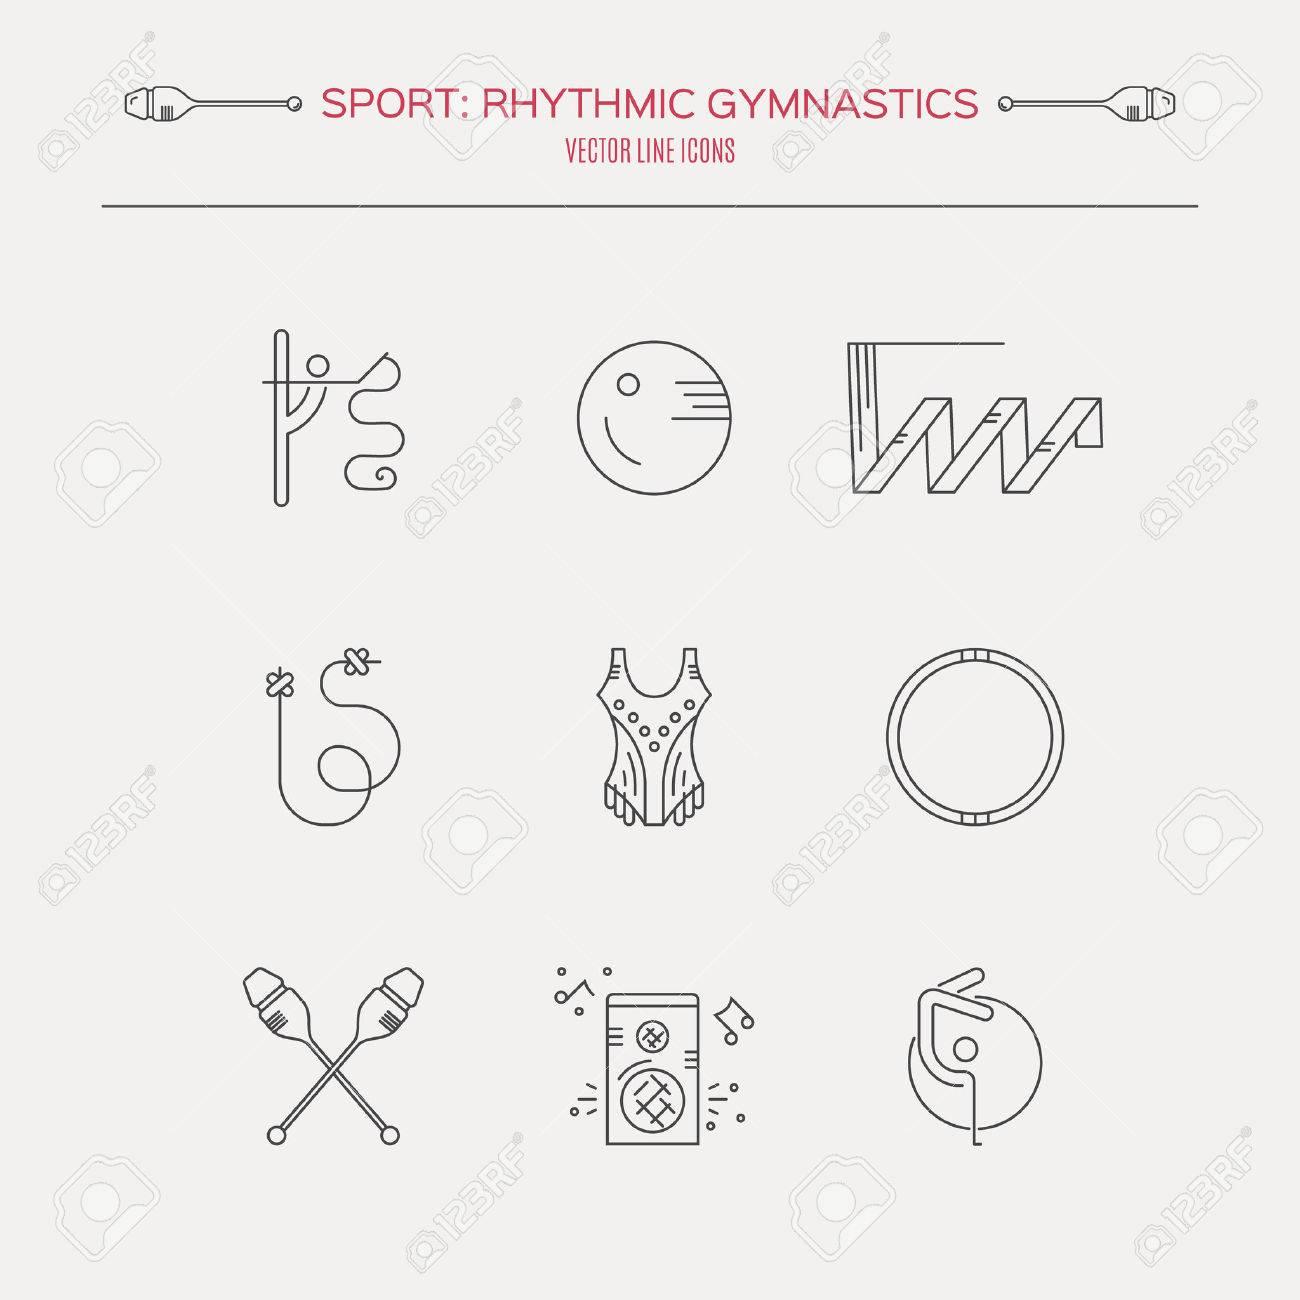 Collection Of Line Modern Vector Symbols Of Rhythmic Gymnastics